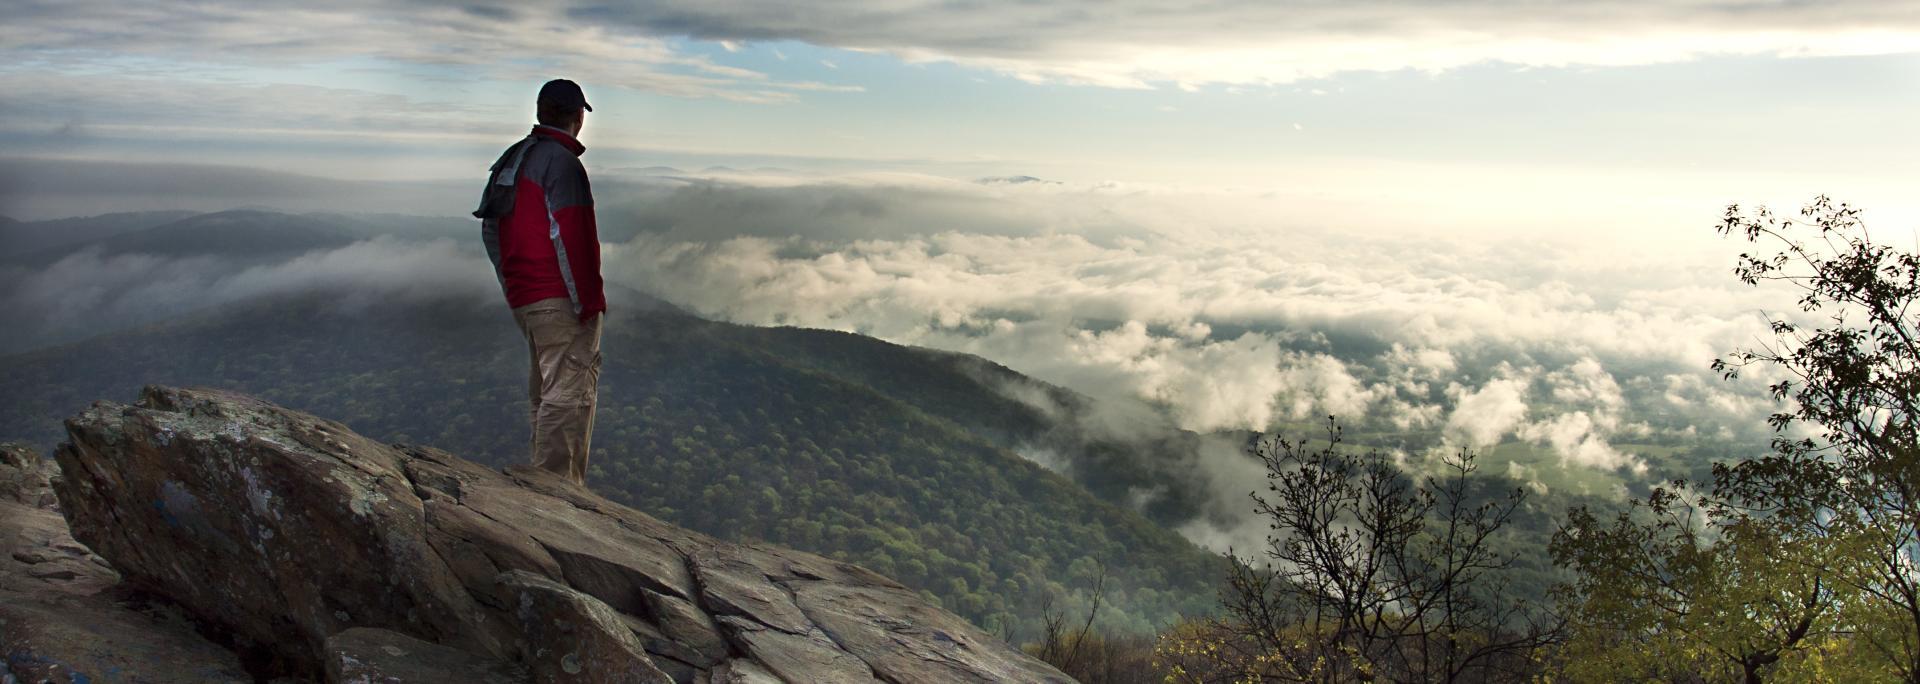 Humpback Rock Hiking